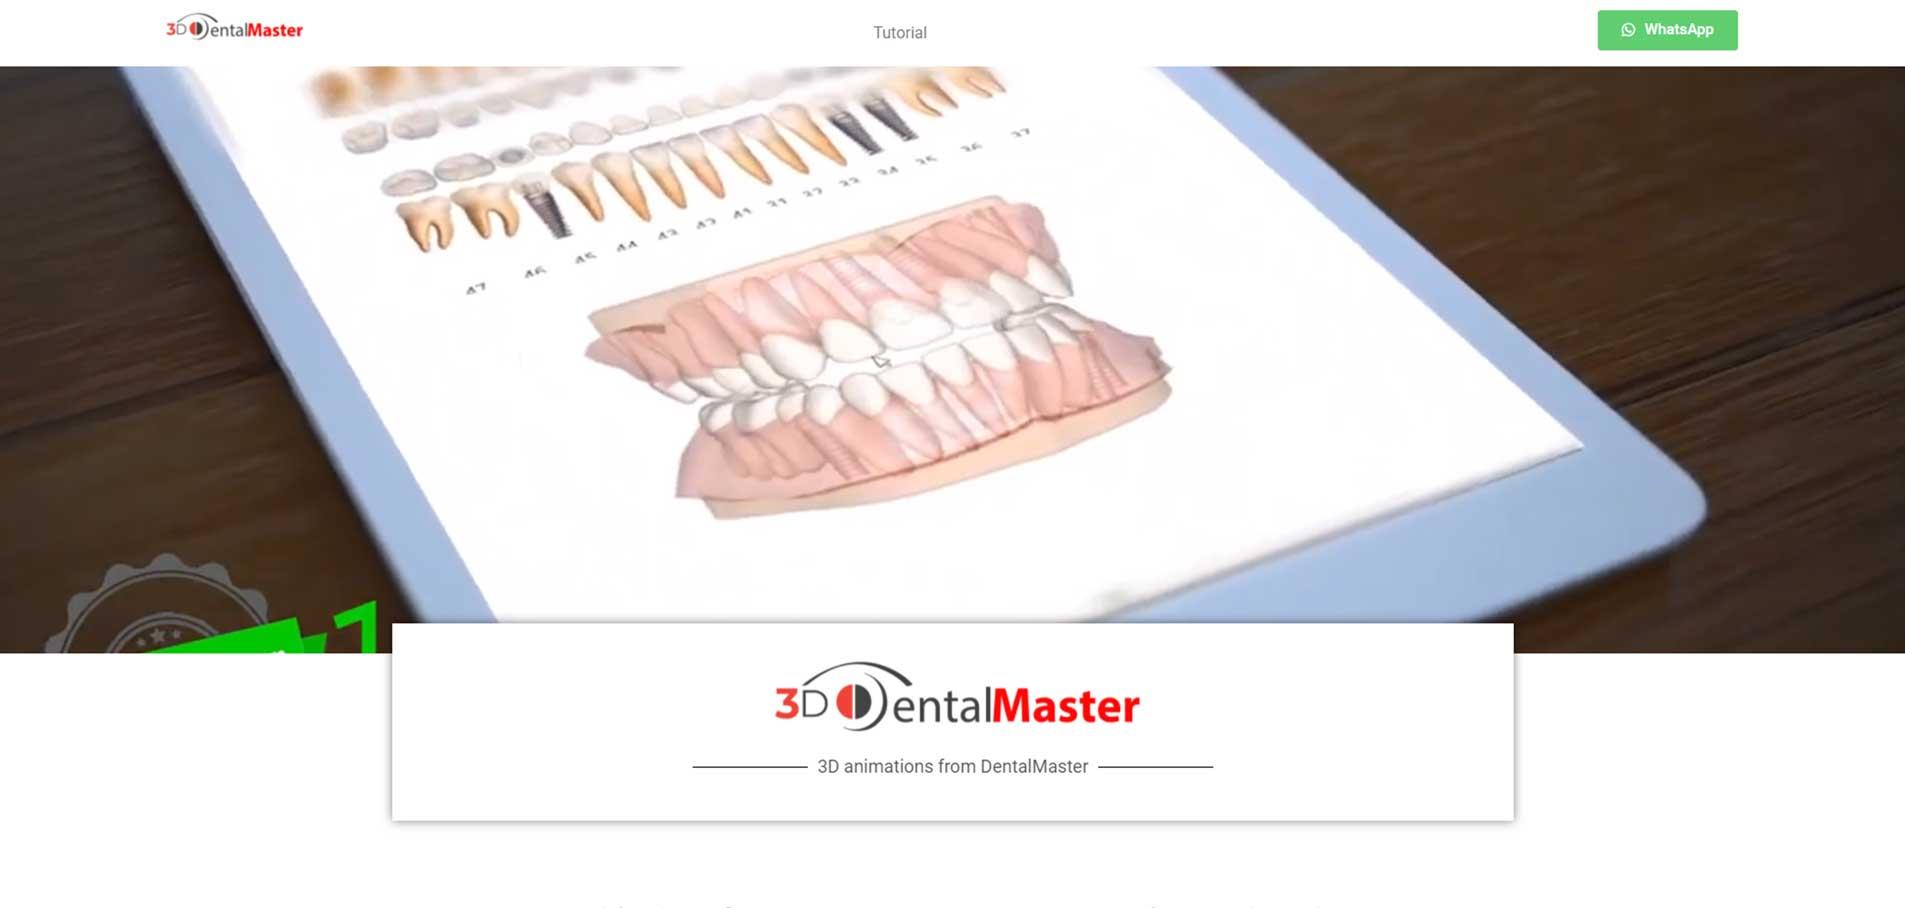 3d-DentalMaster website